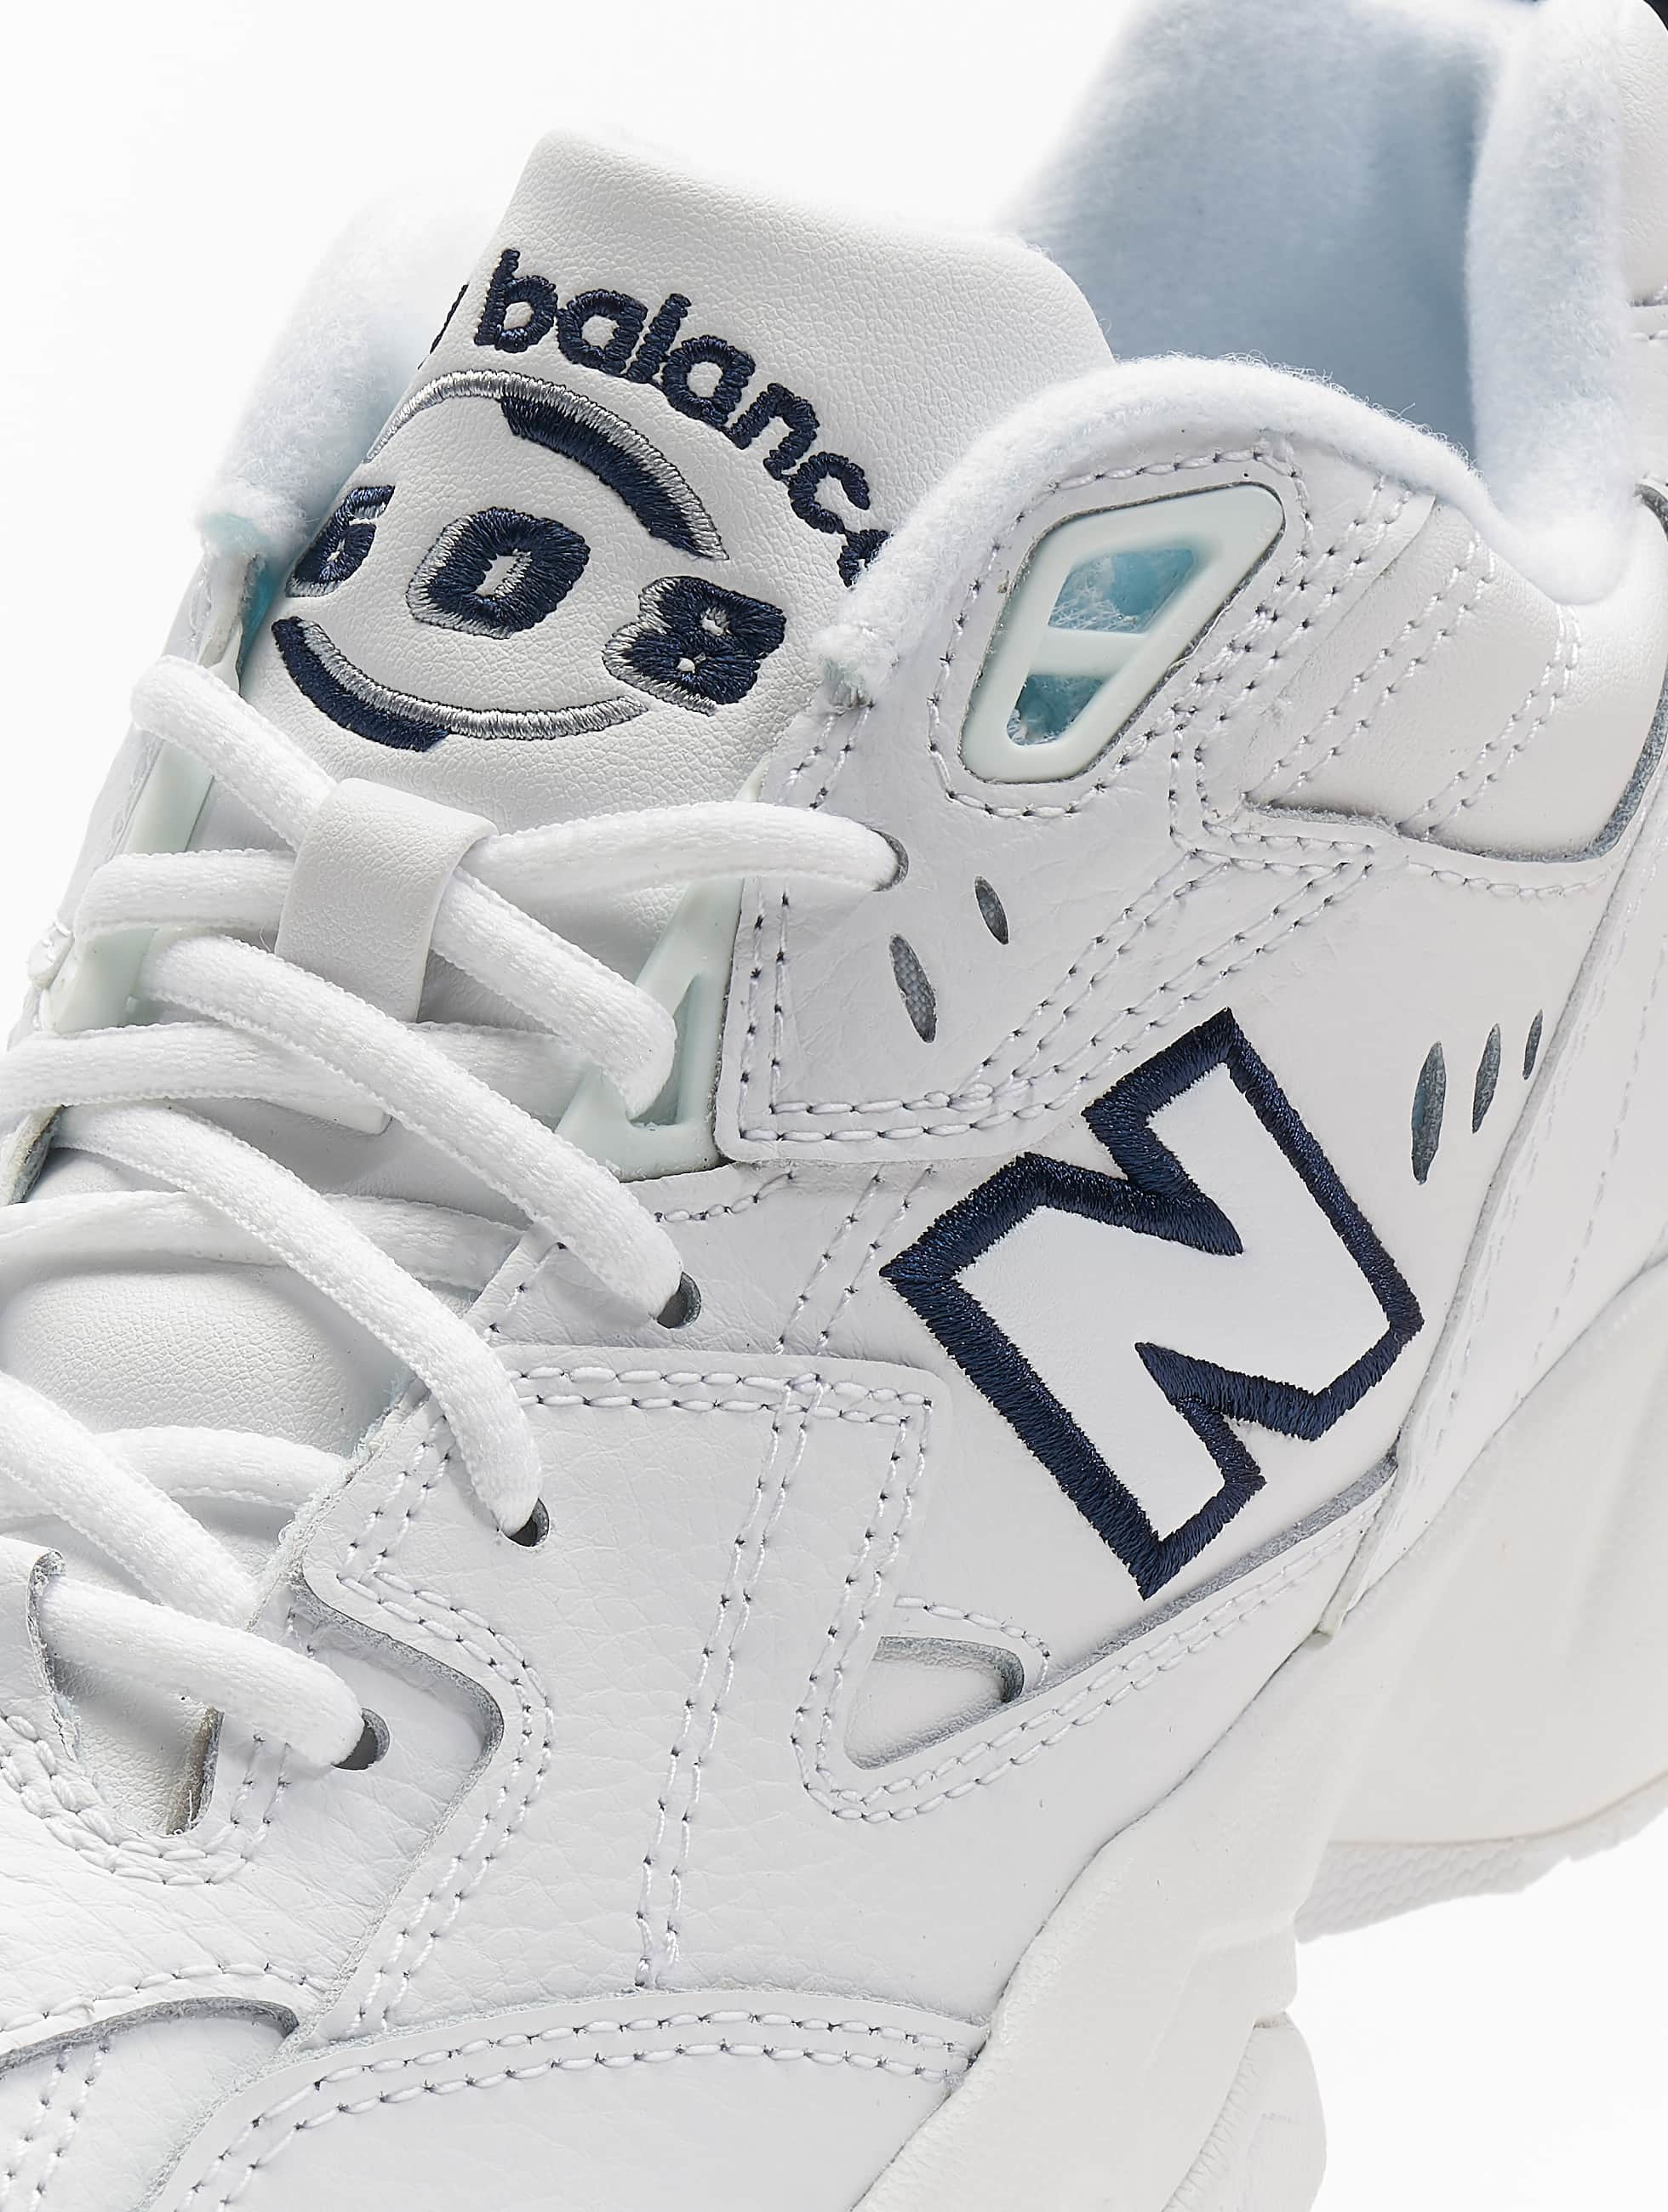 e742035caa74c https://www.def-shop.com/buffalo-london-1452-14-leather-sneakers ...